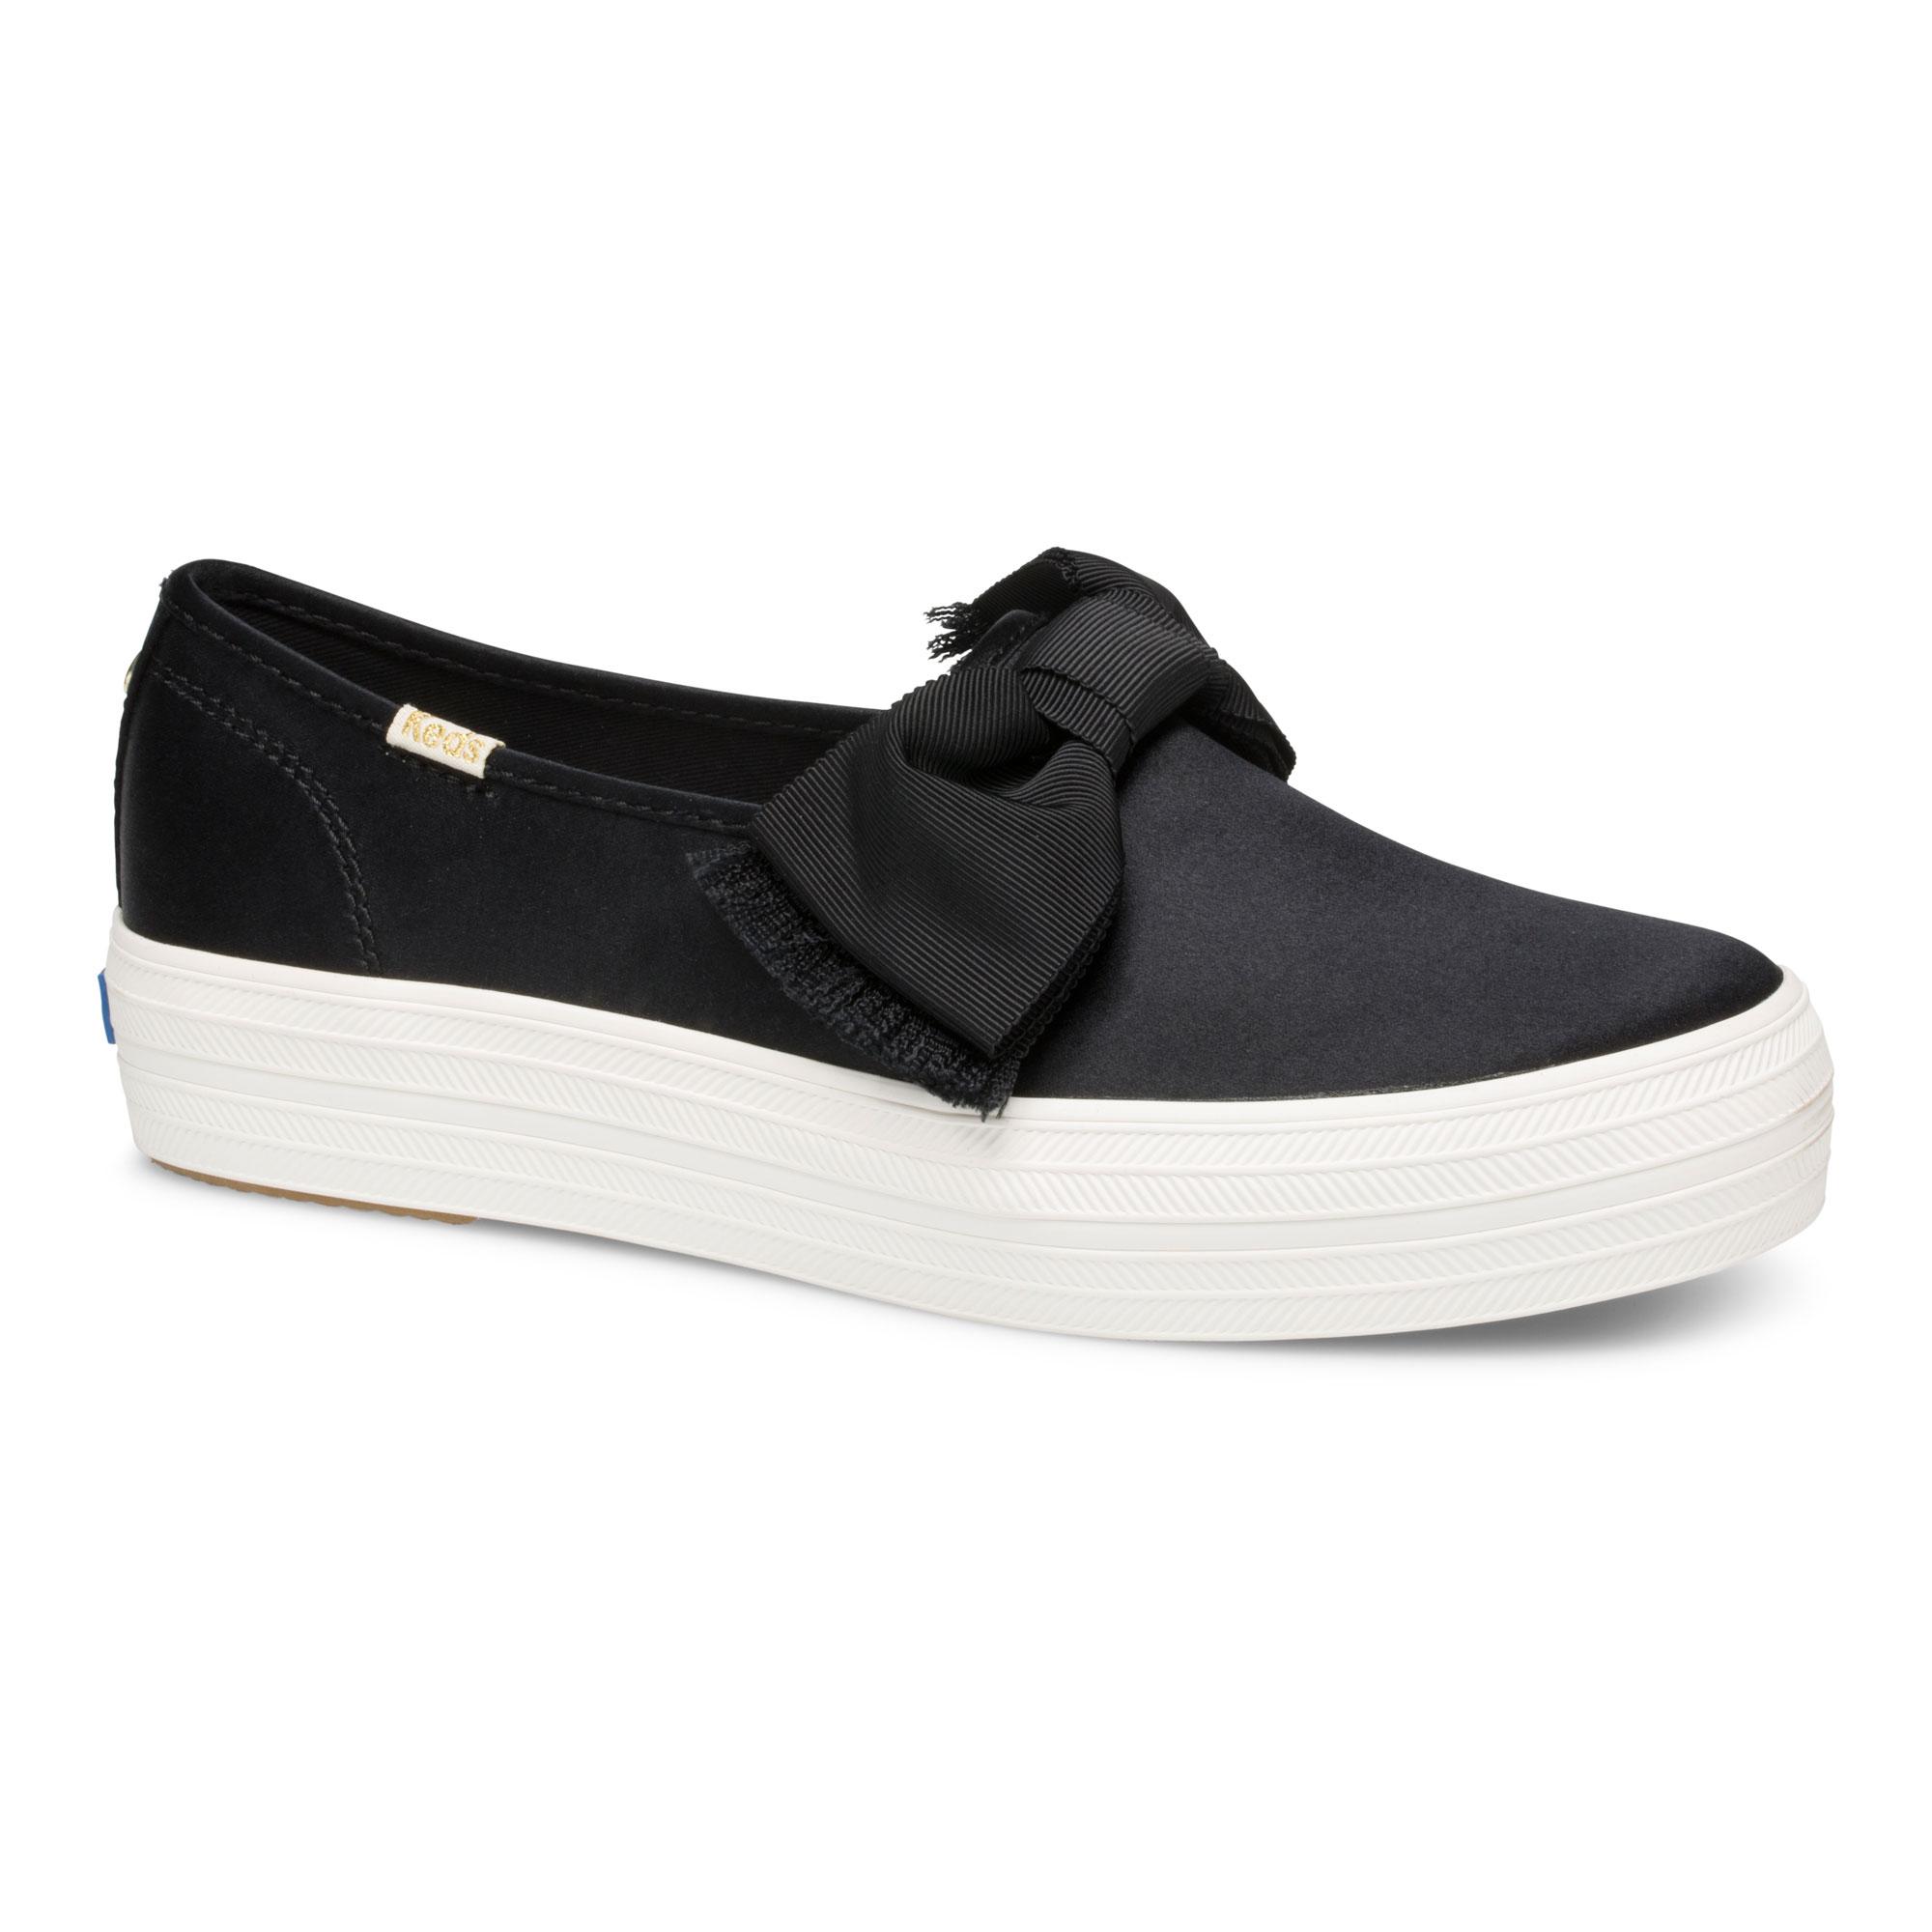 322f5a1c6e6 Keds x Kate Spade New York Spring 2019 Bridal Sneakers  Shop